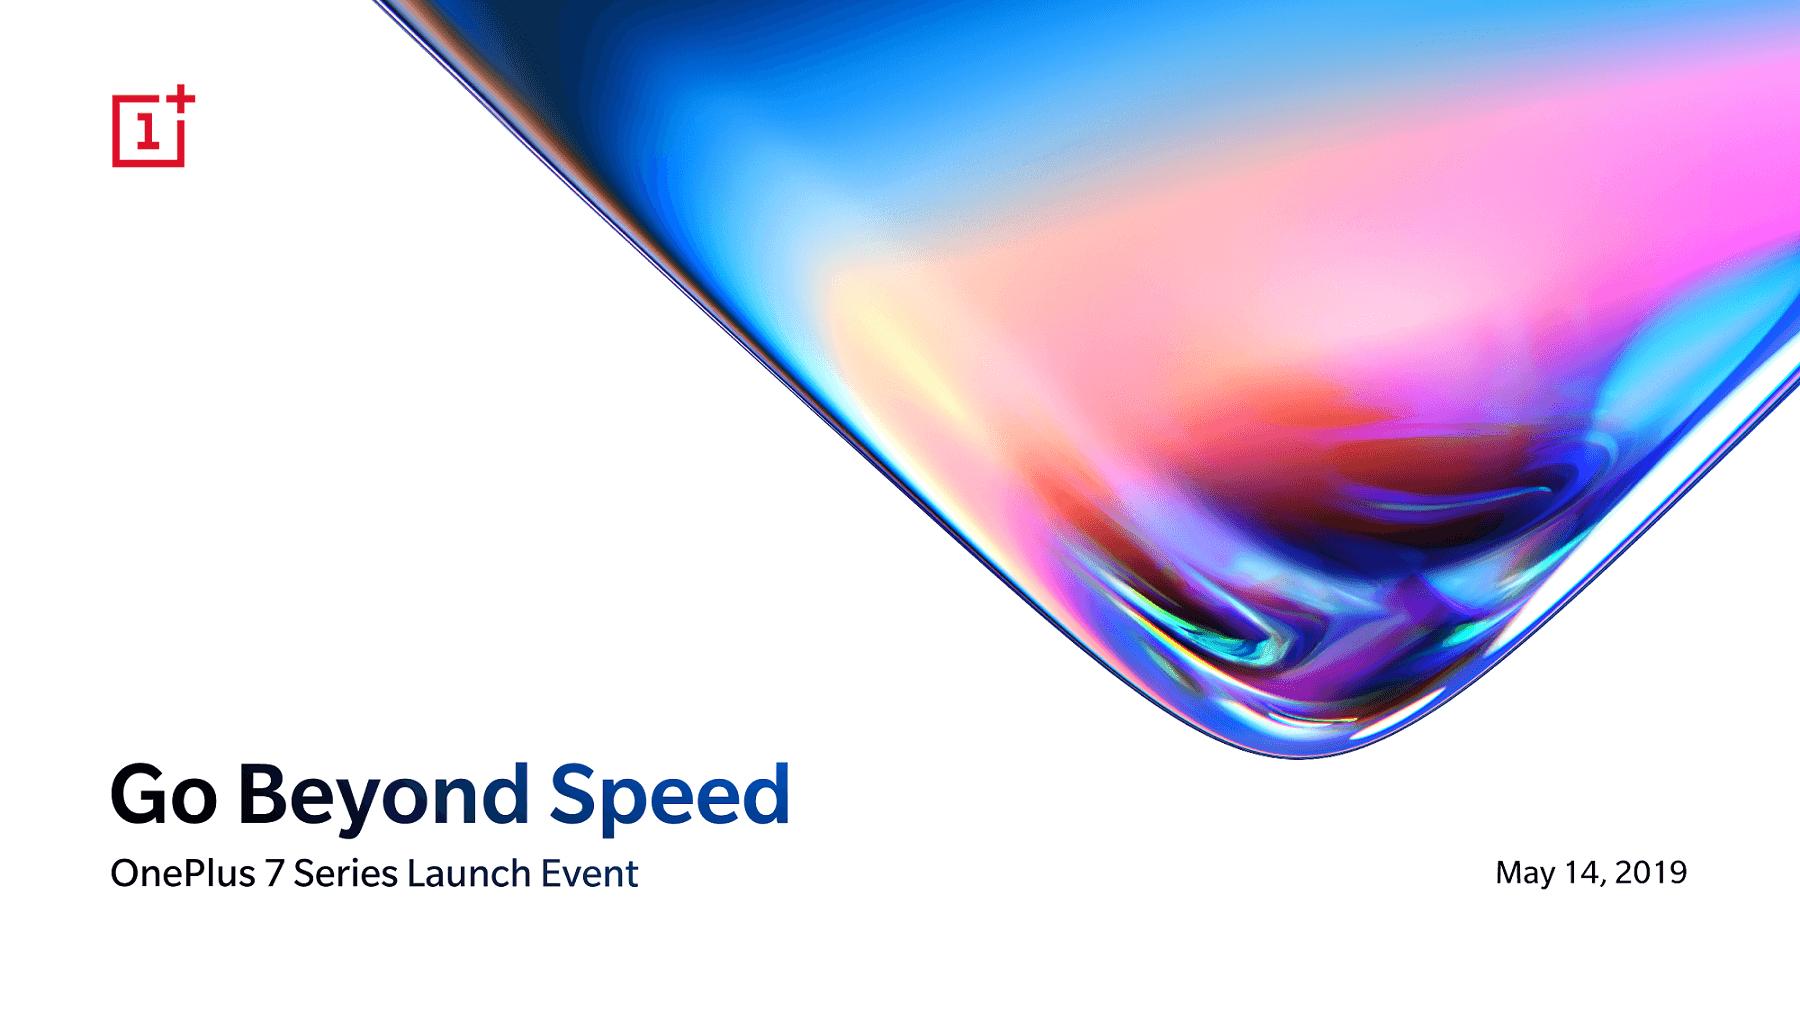 Go Beyond Speed - OnePlus 7